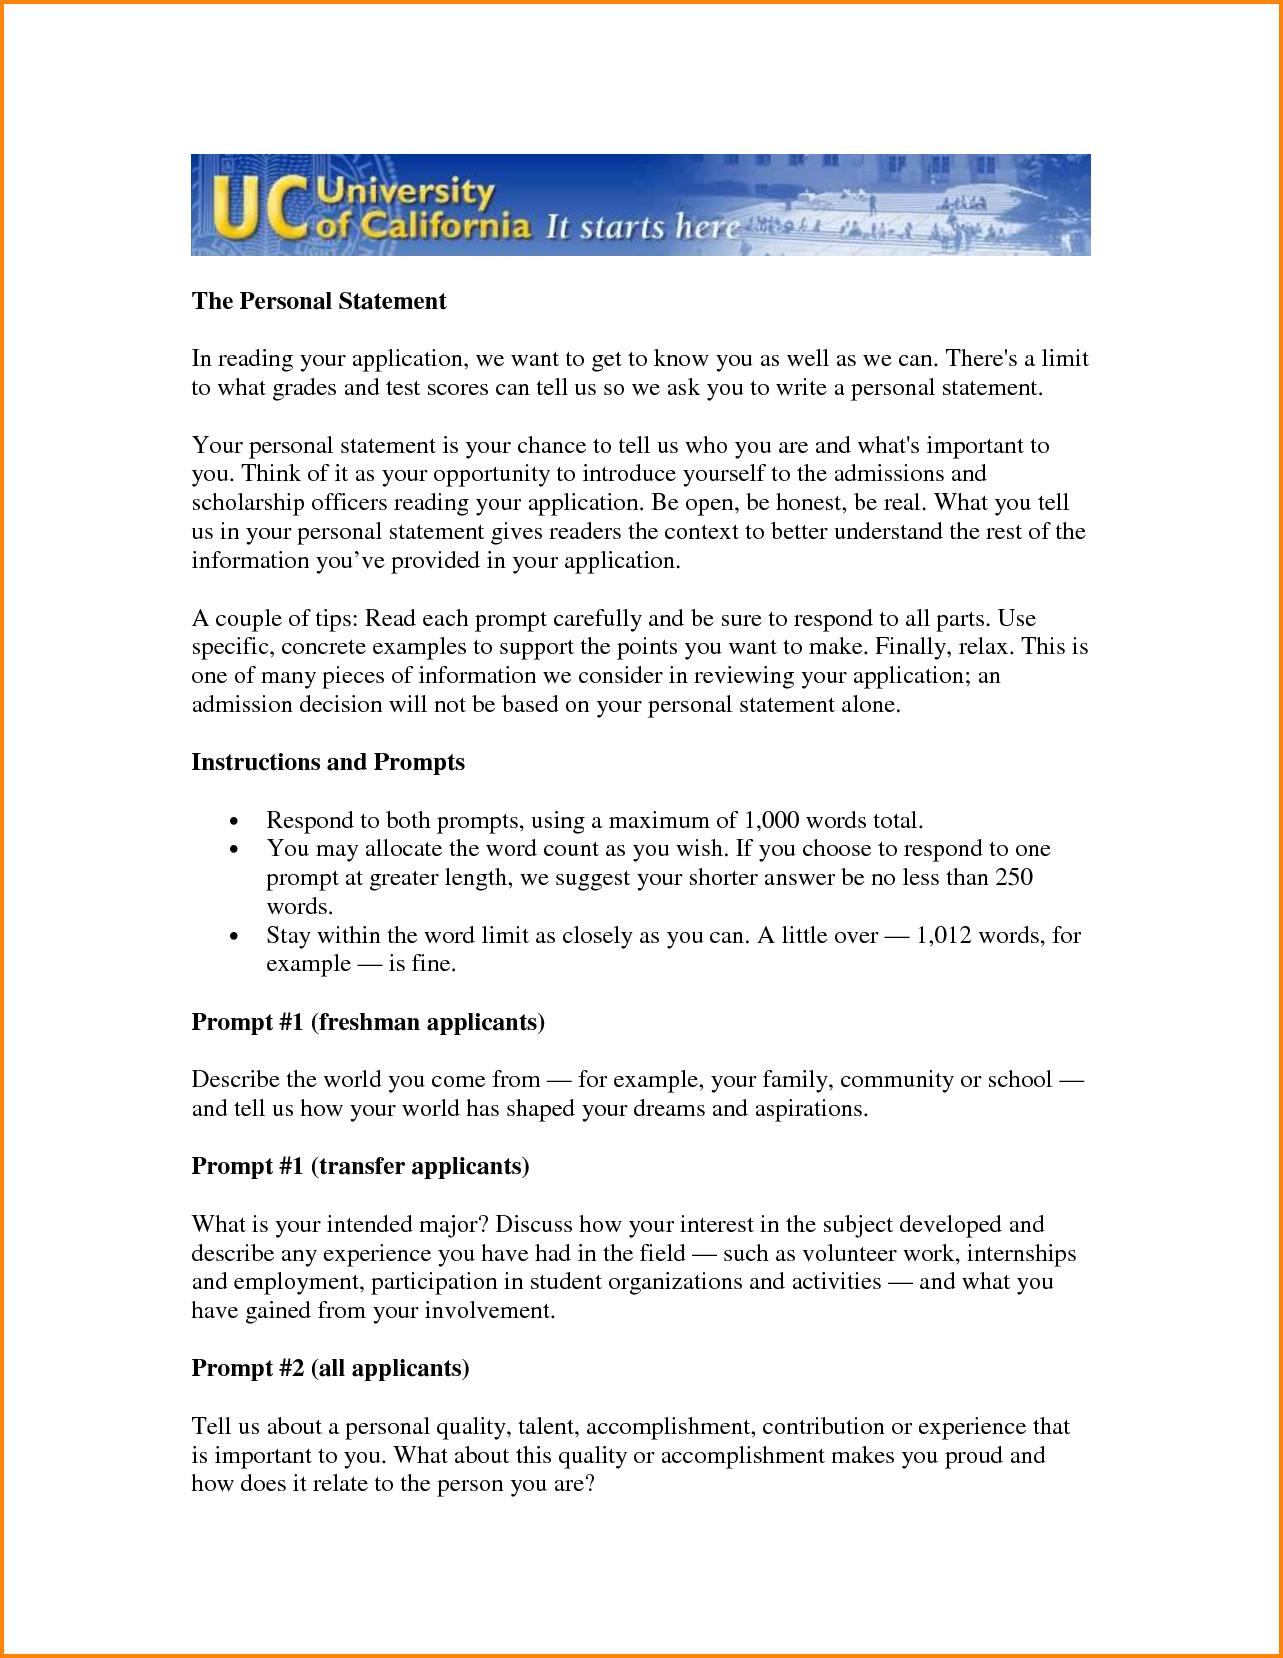 016 Uc Essay Prompt Application Prompts Davis College Personal Statement Guy Berkeleys Imposing 2015 2016-17 Examples Berkeley Full